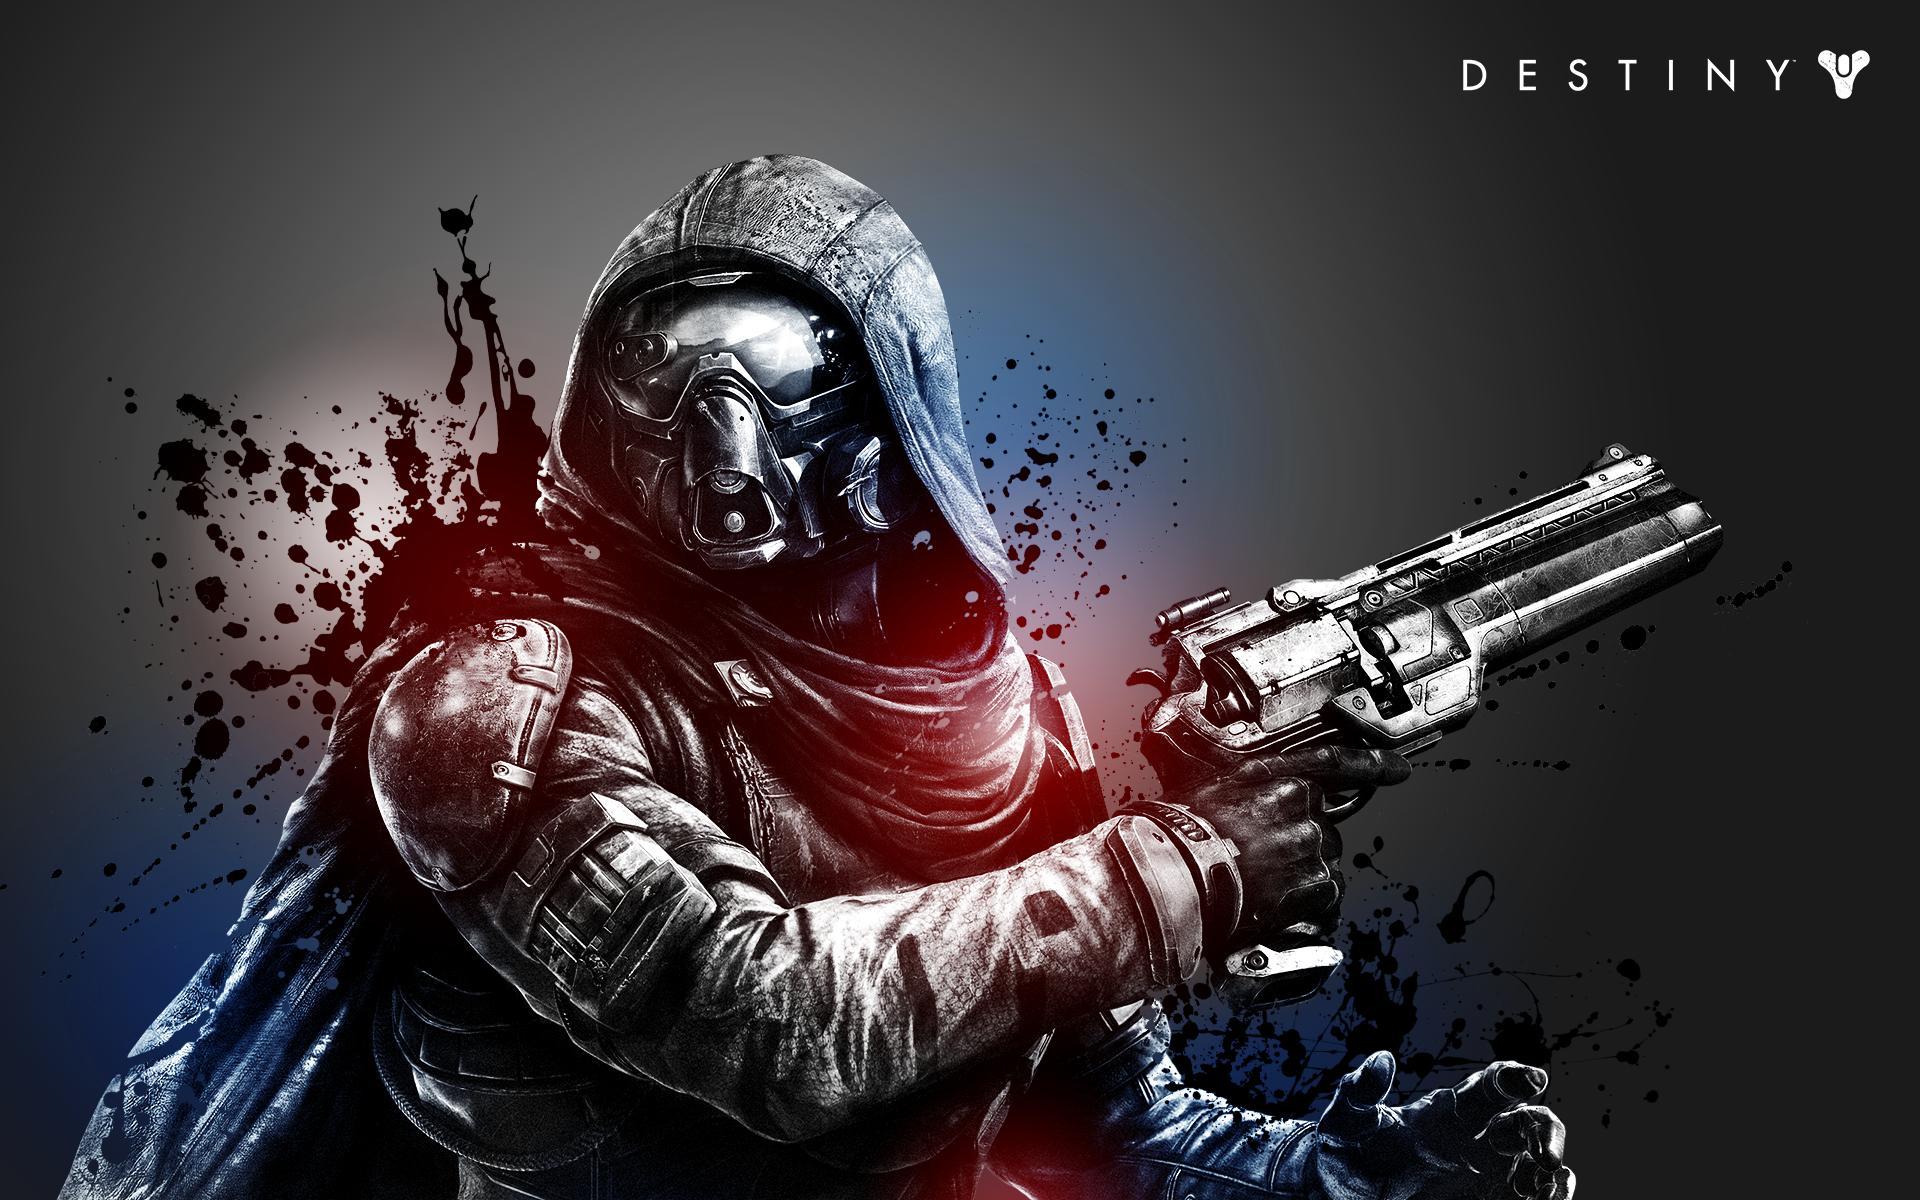 Destiny 2 Background Hd: Cool Destiny Wallpaper